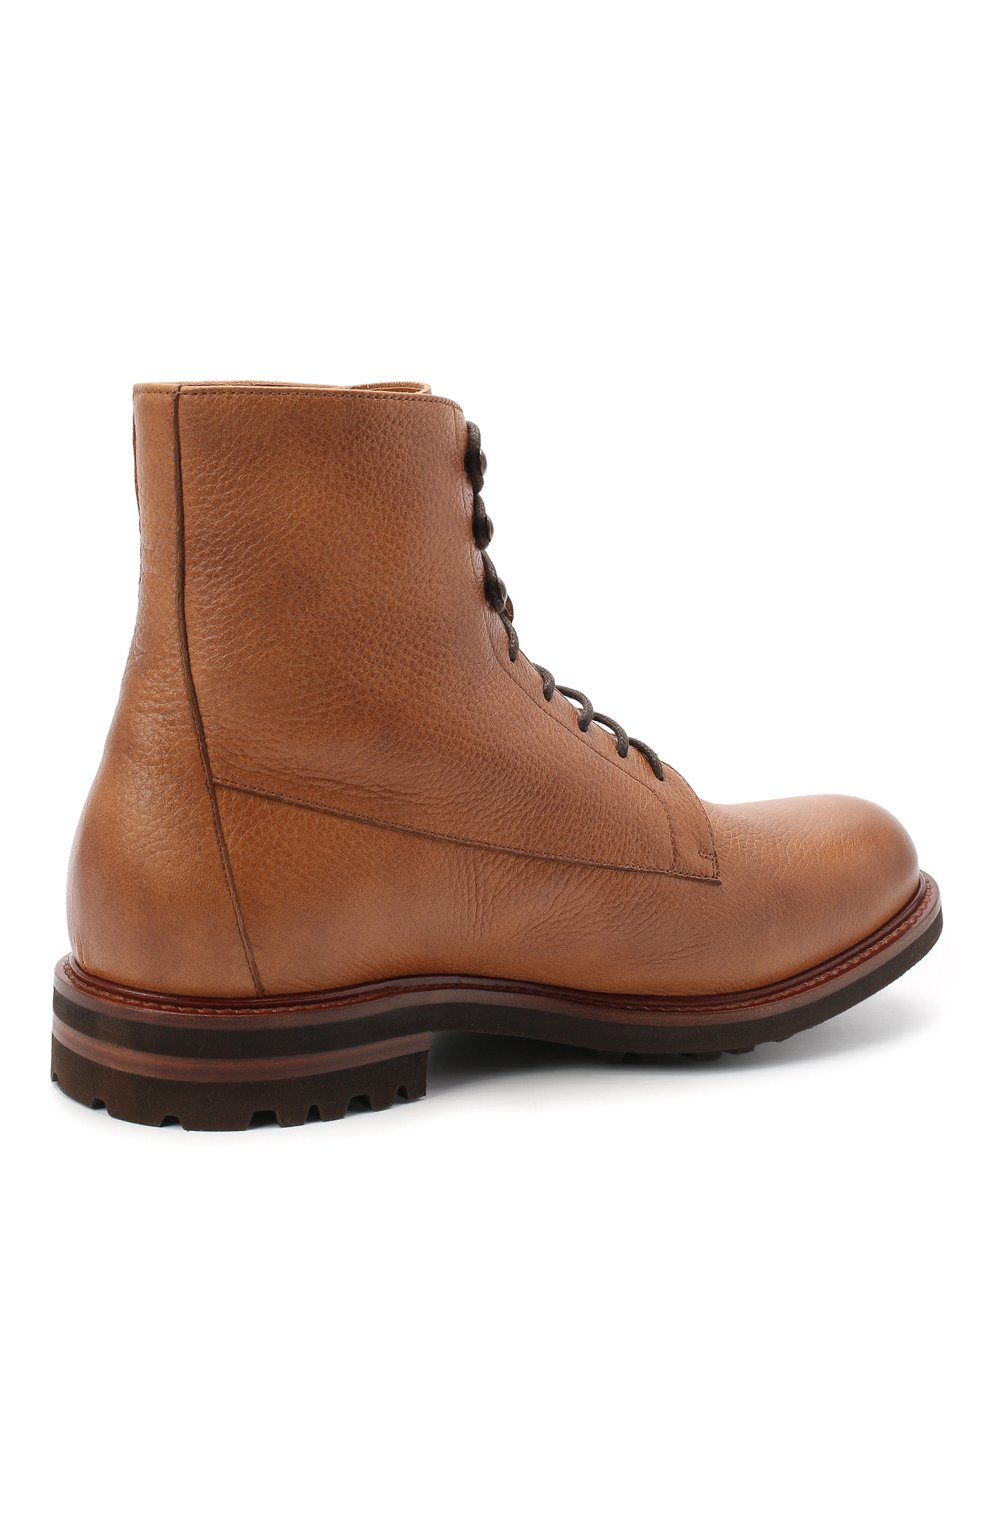 Мужские кожаные ботинки BRUNELLO CUCINELLI бежевого цвета, арт. MZUCPAM957 | Фото 4